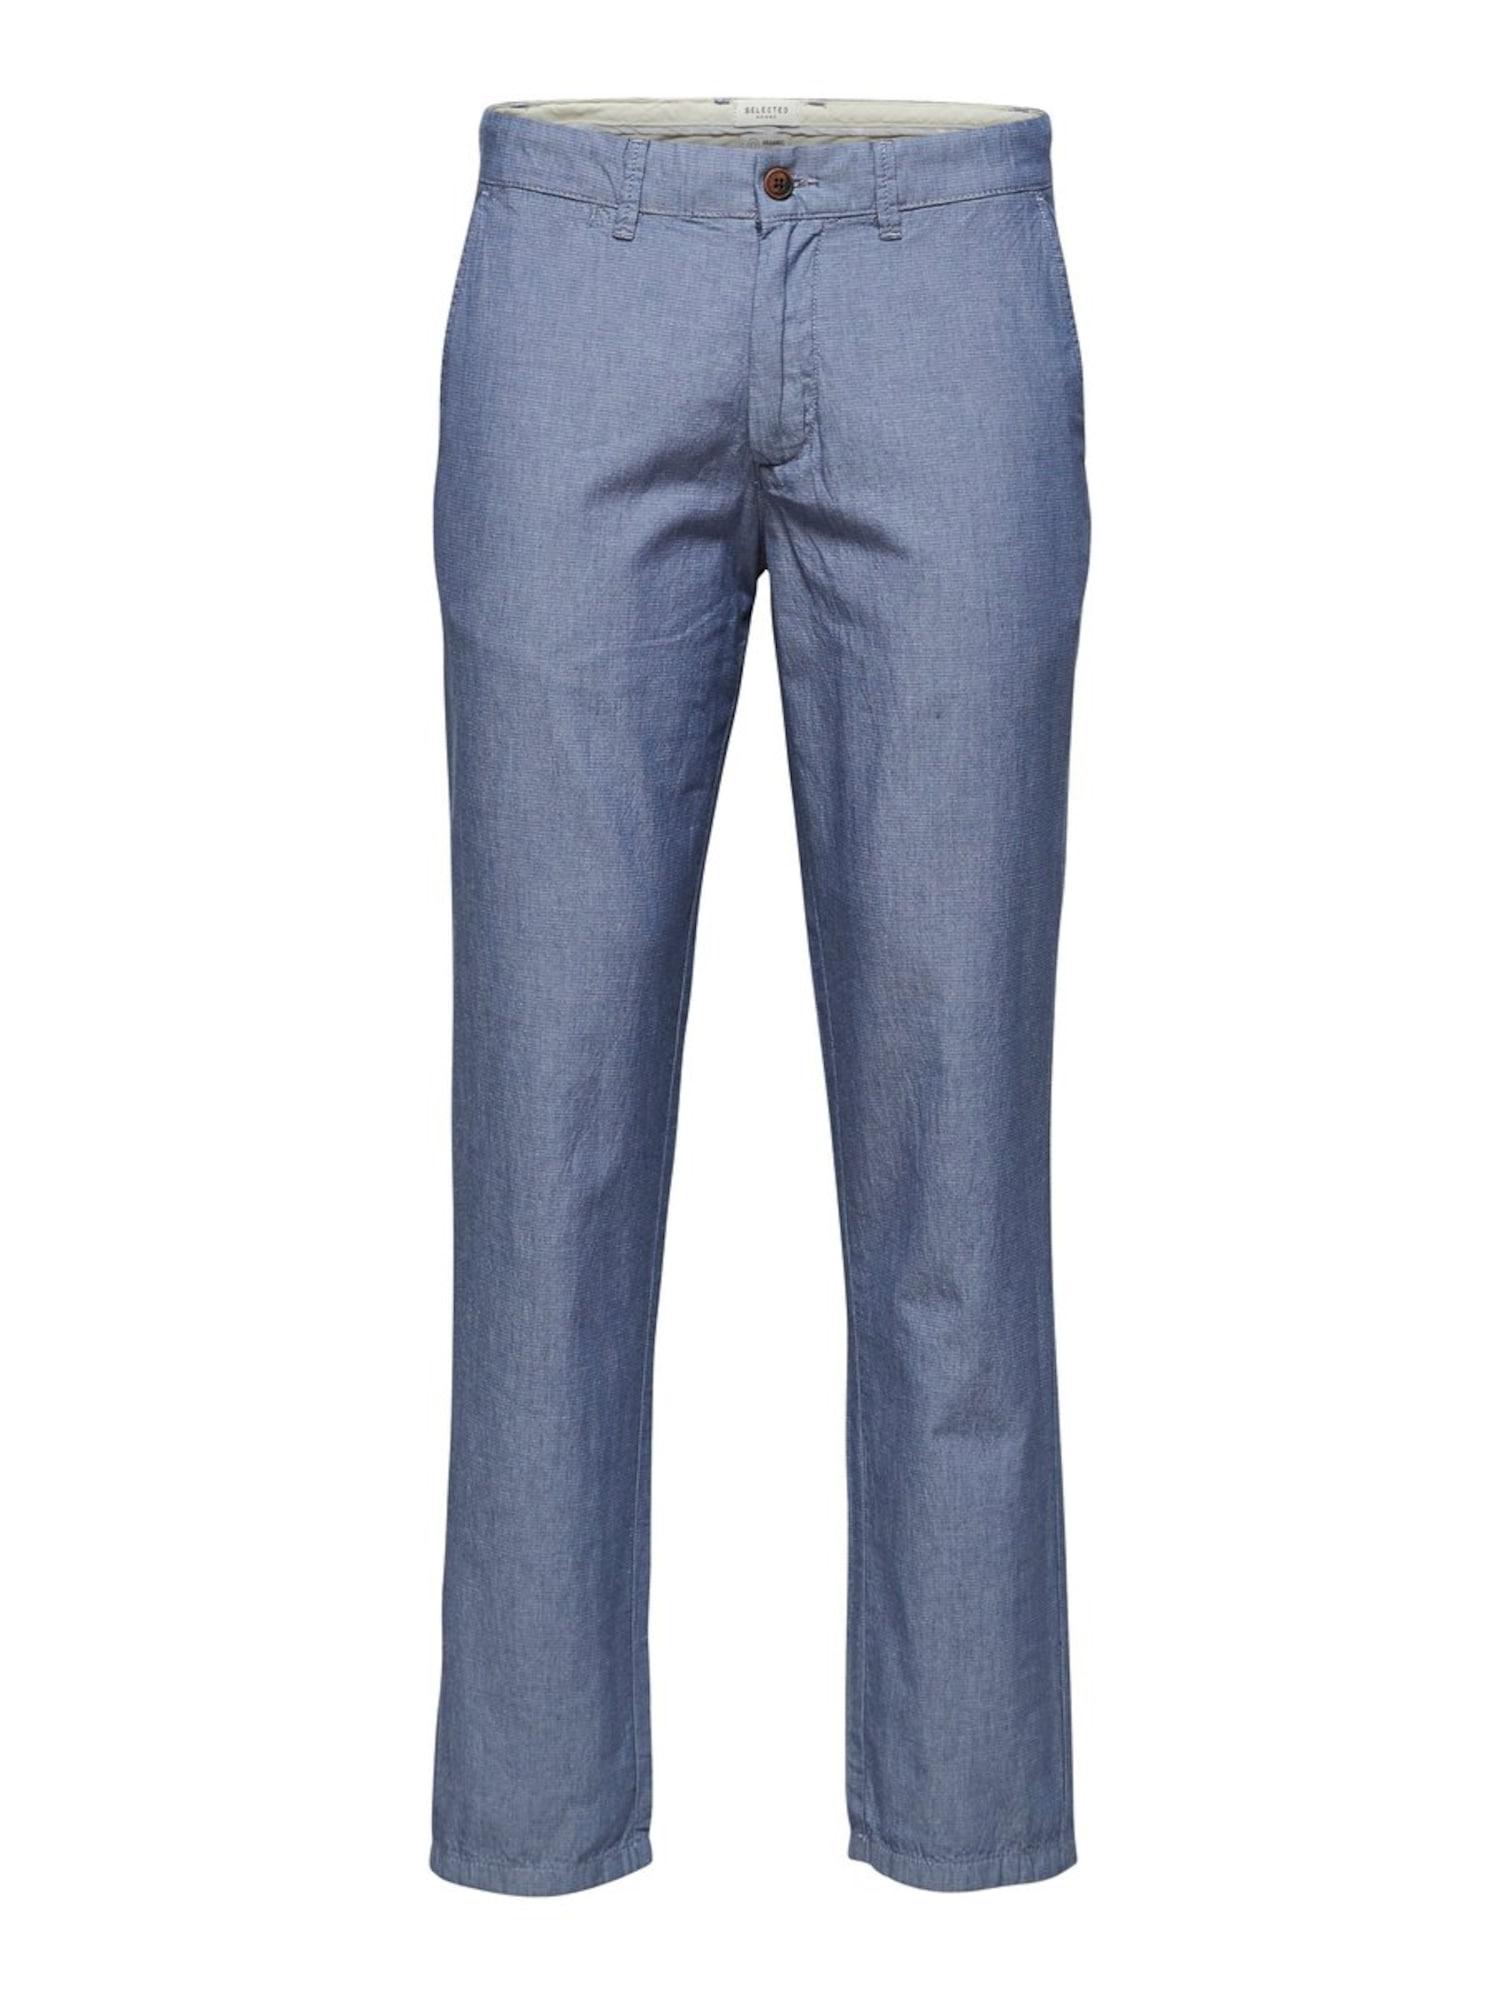 SELECTED HOMME Kalhoty  modrý melír